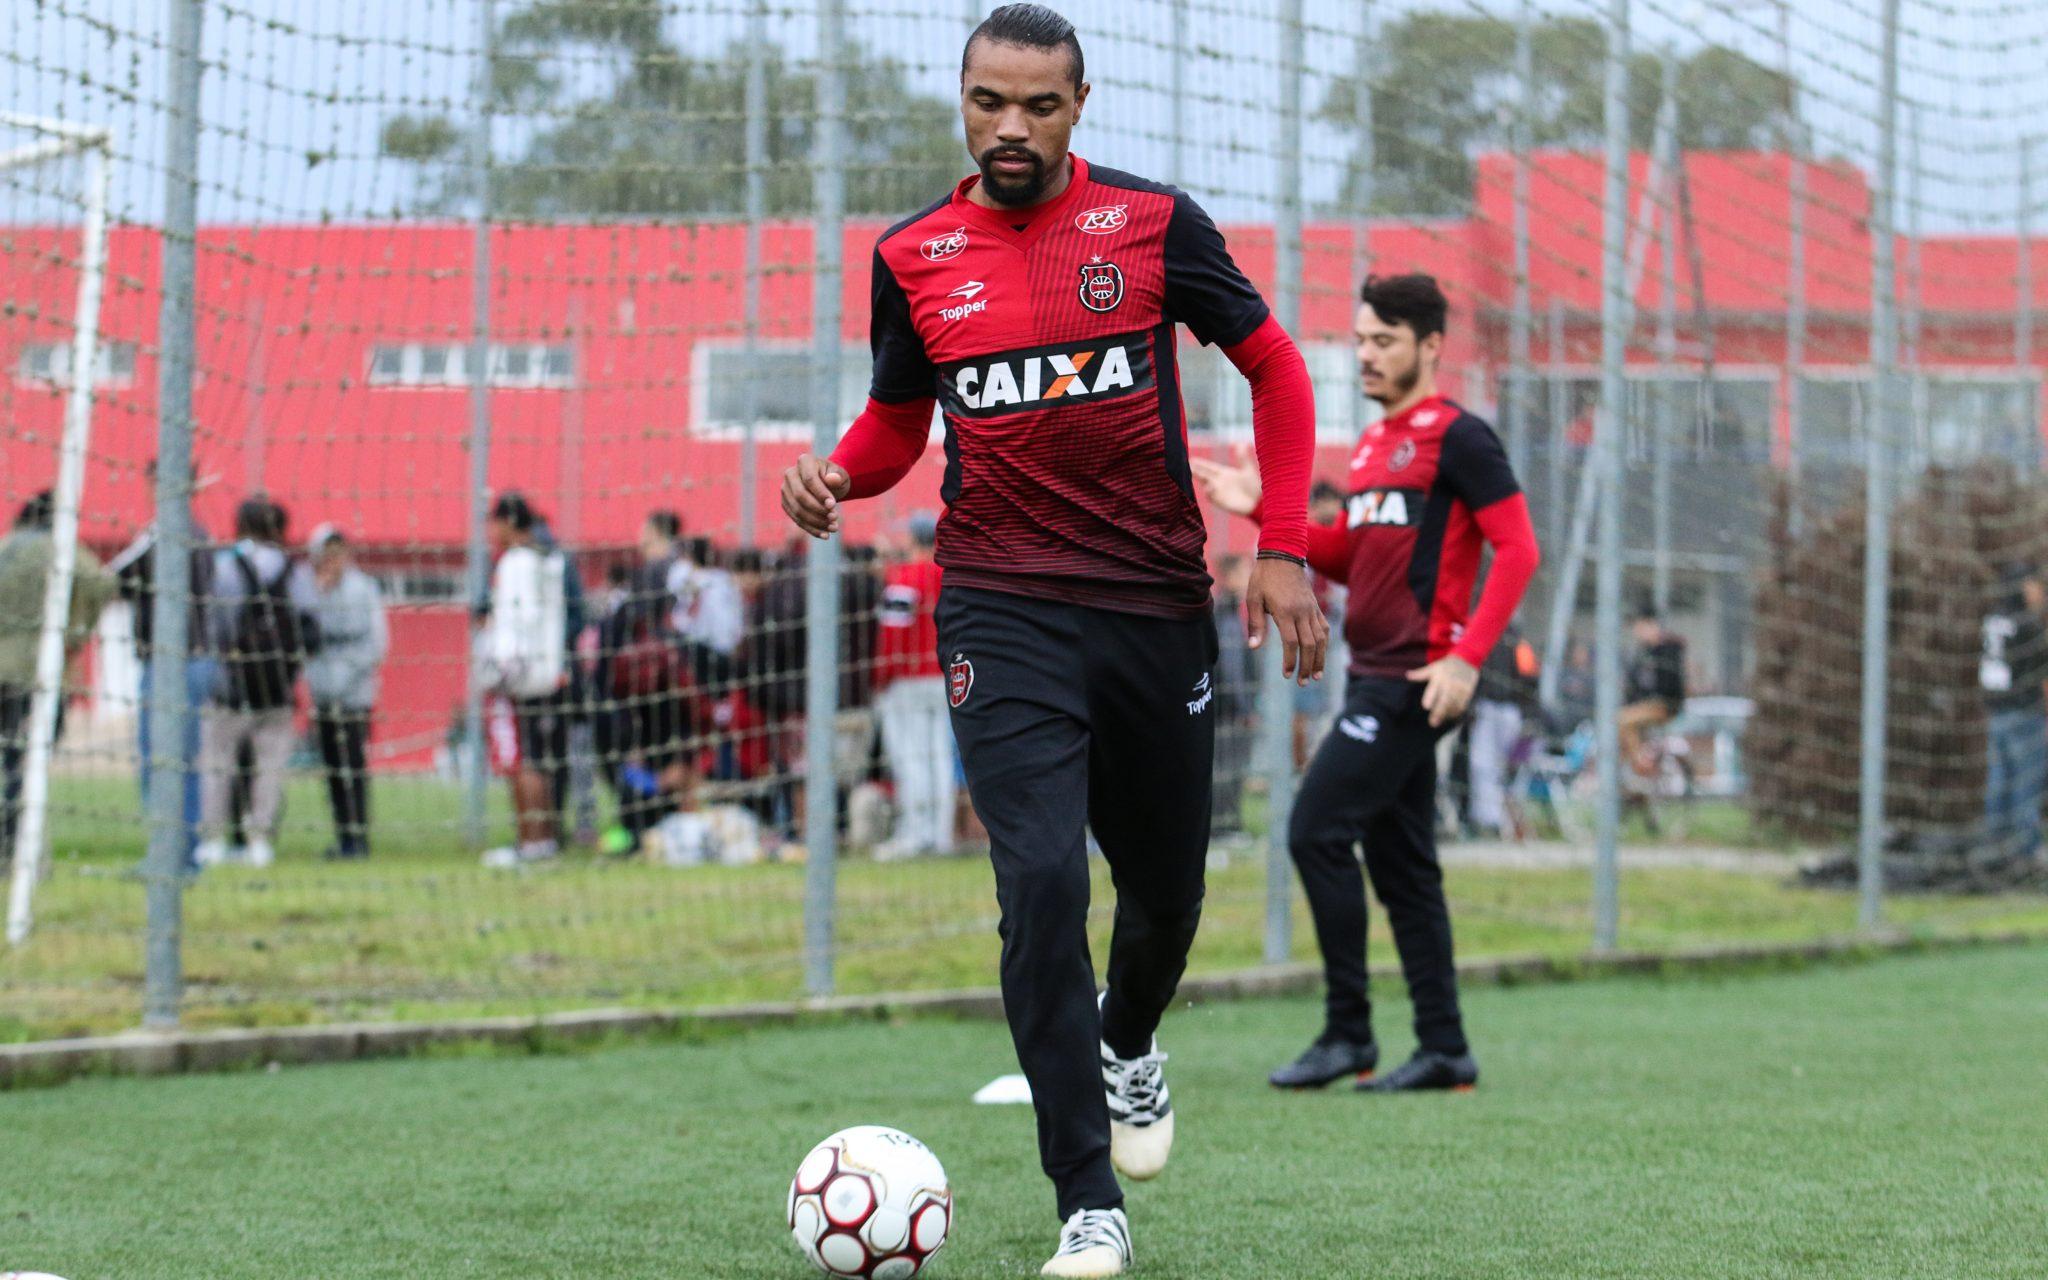 Brasil-Pel: Wagner é rubro-negro